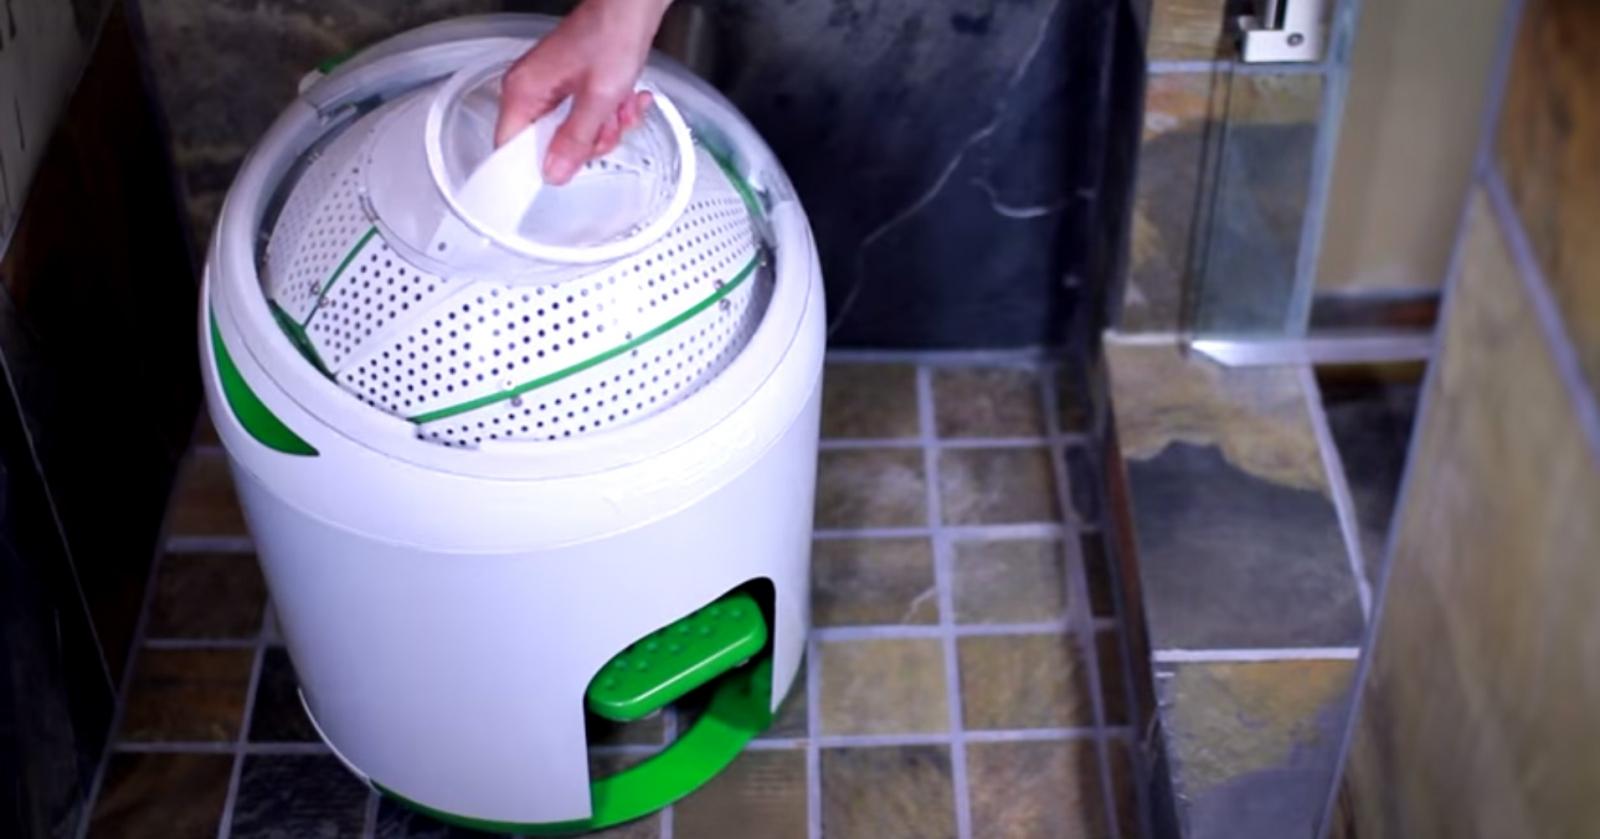 The Yirego Drumi foot-powered washing machine